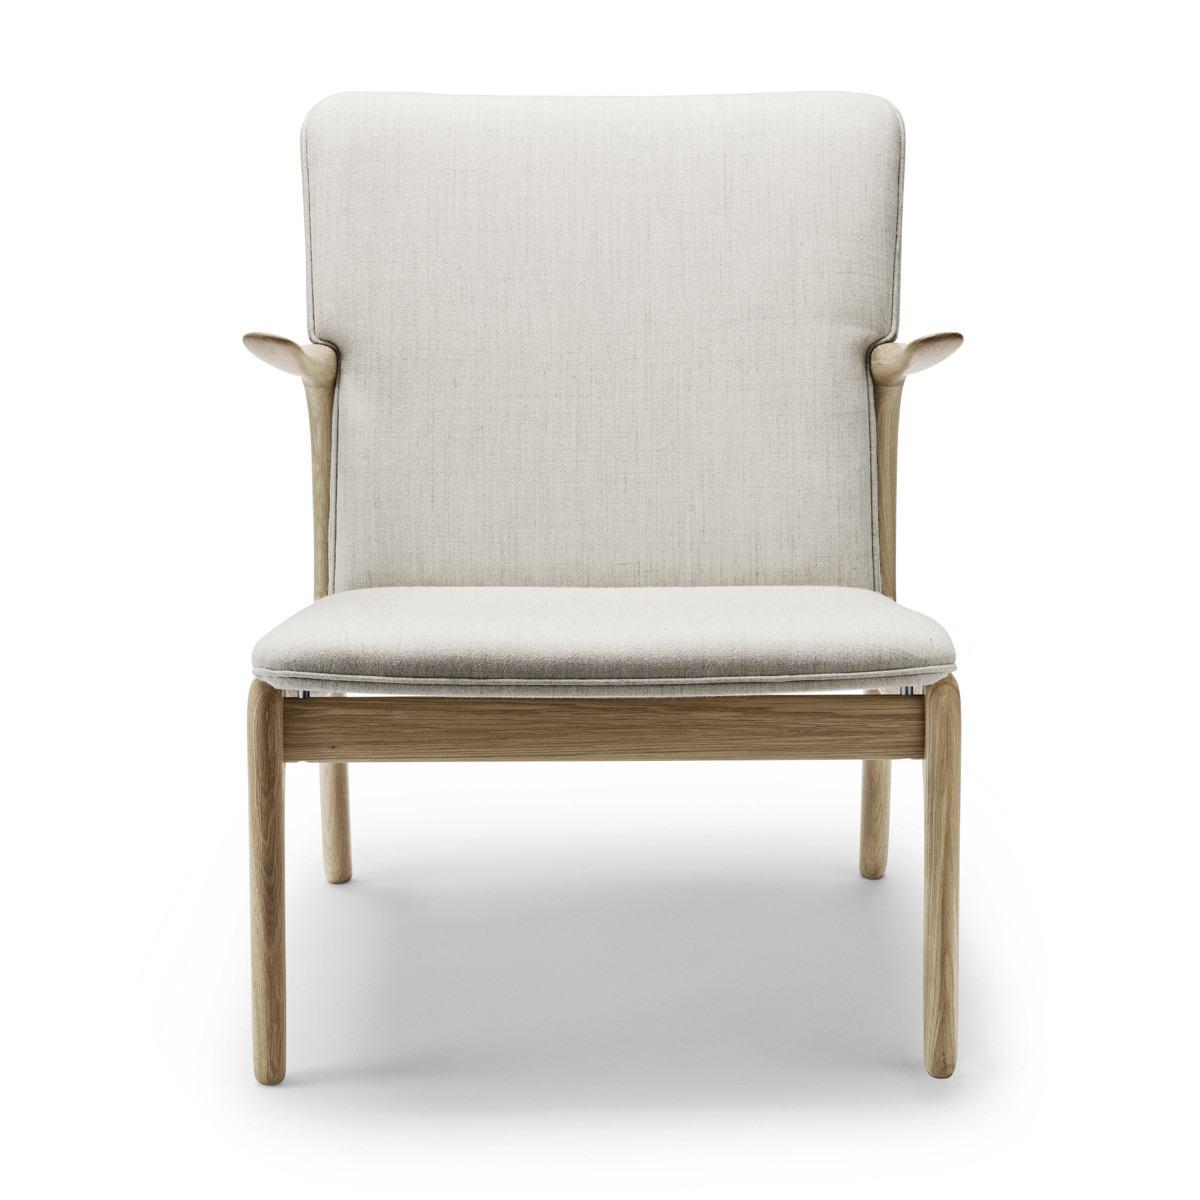 Carl Hansen OW124 Beak Chair - White Oiled Oak